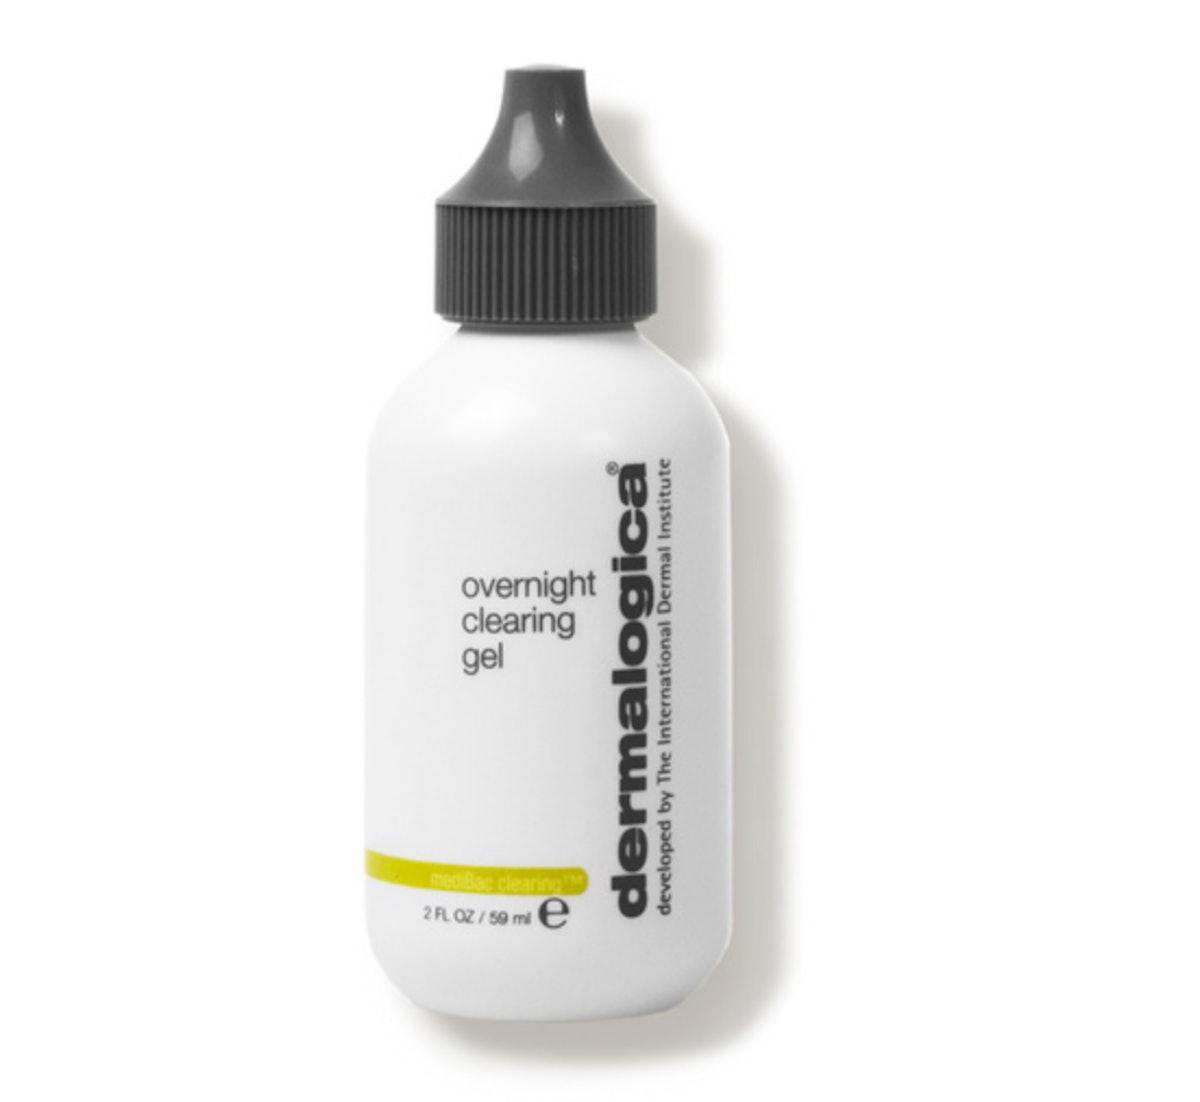 Dermalogica MediBac Clearing Overnight Clearing Gel (1.7 oz.)